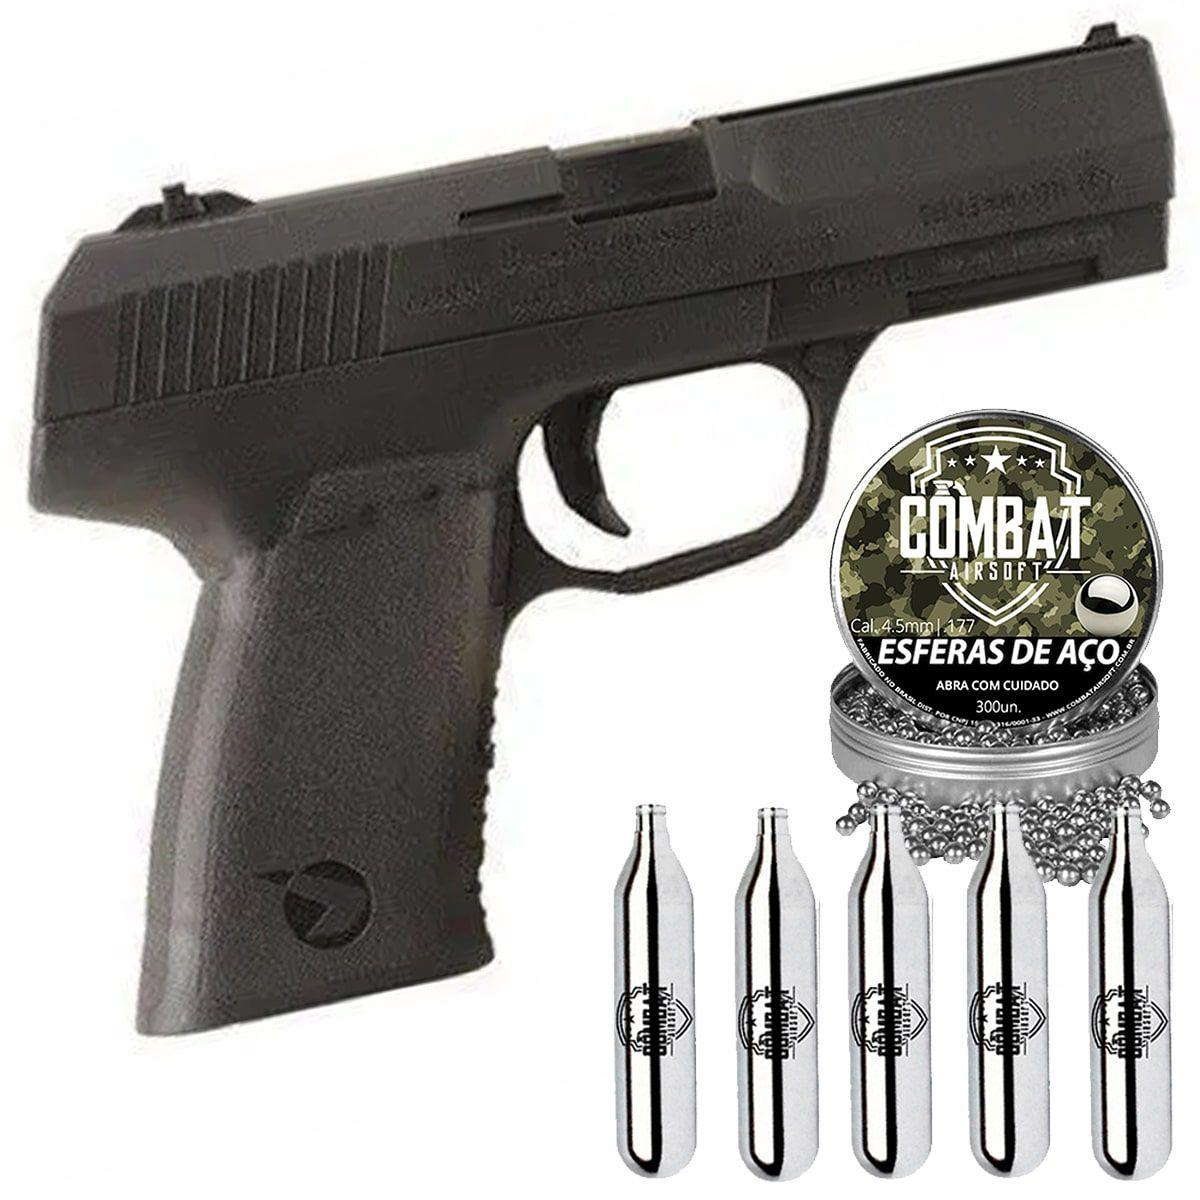 Pistola De Pressão CO2 Gamo PX-107 4,5mm + CO2 + Esferas de Aço